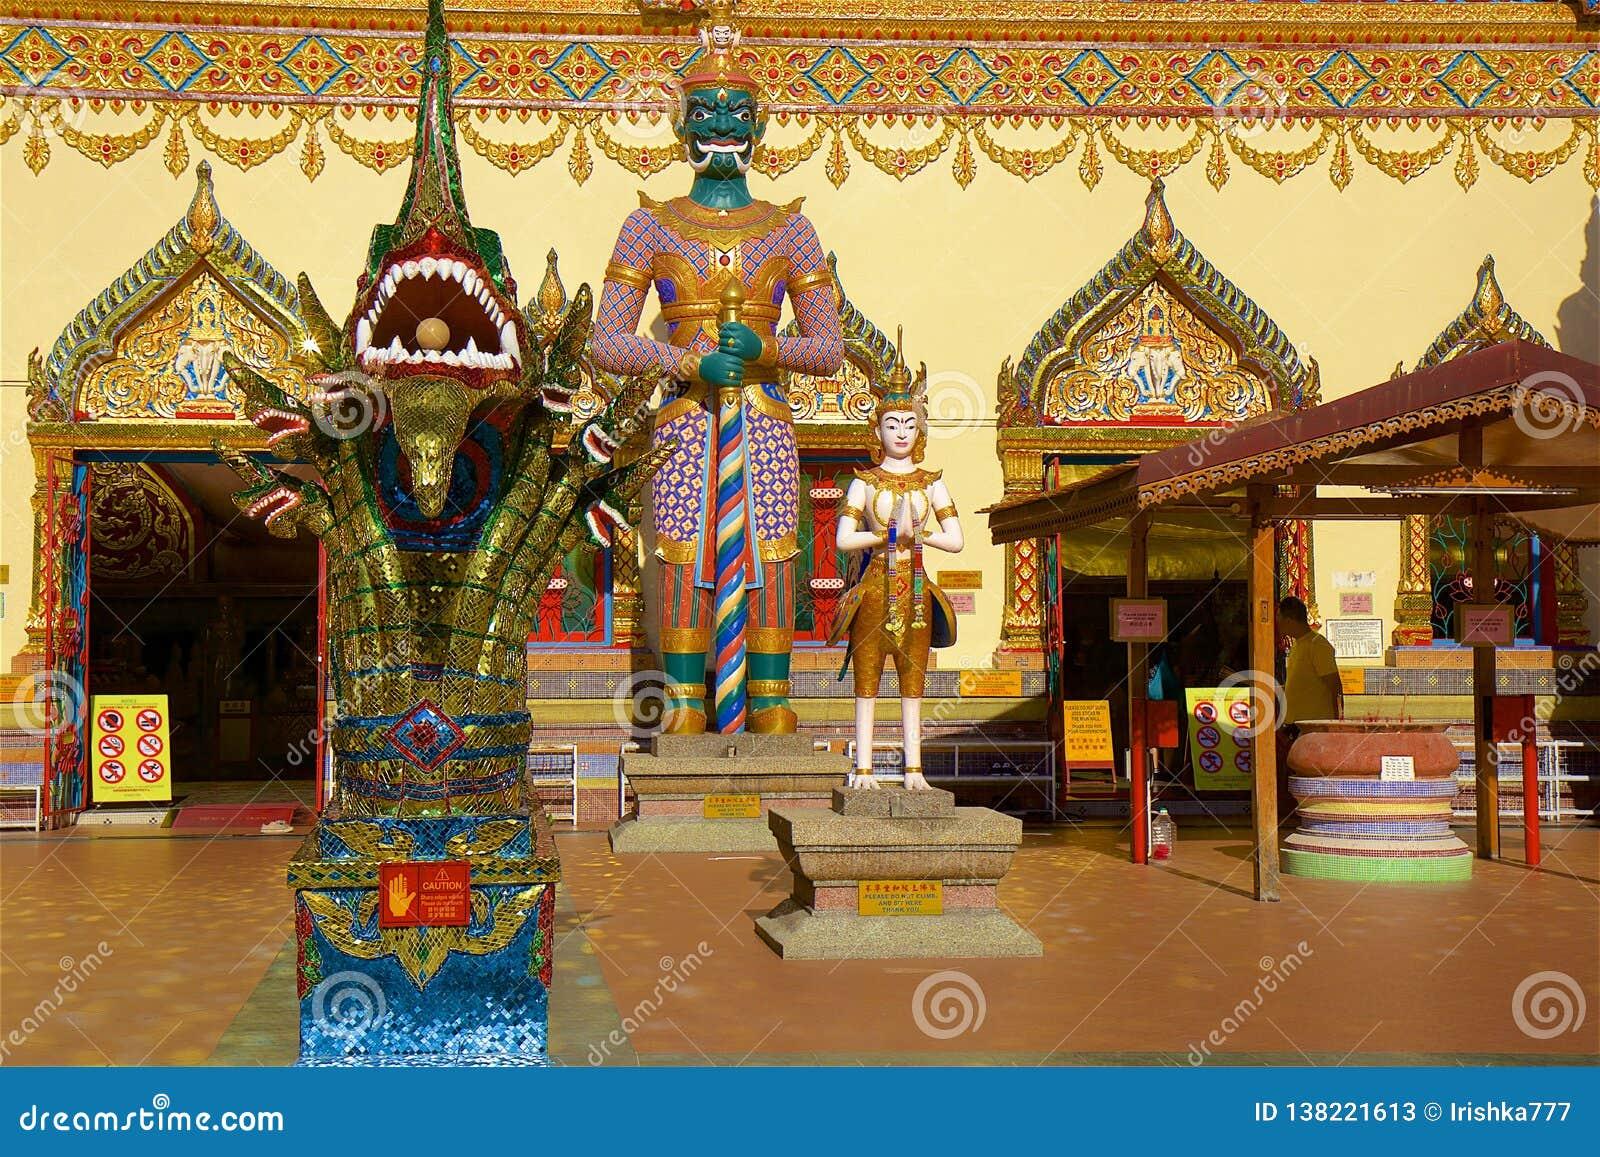 Wat Chayamangkalaram Thai Temple of the Reclining Buddha Penang